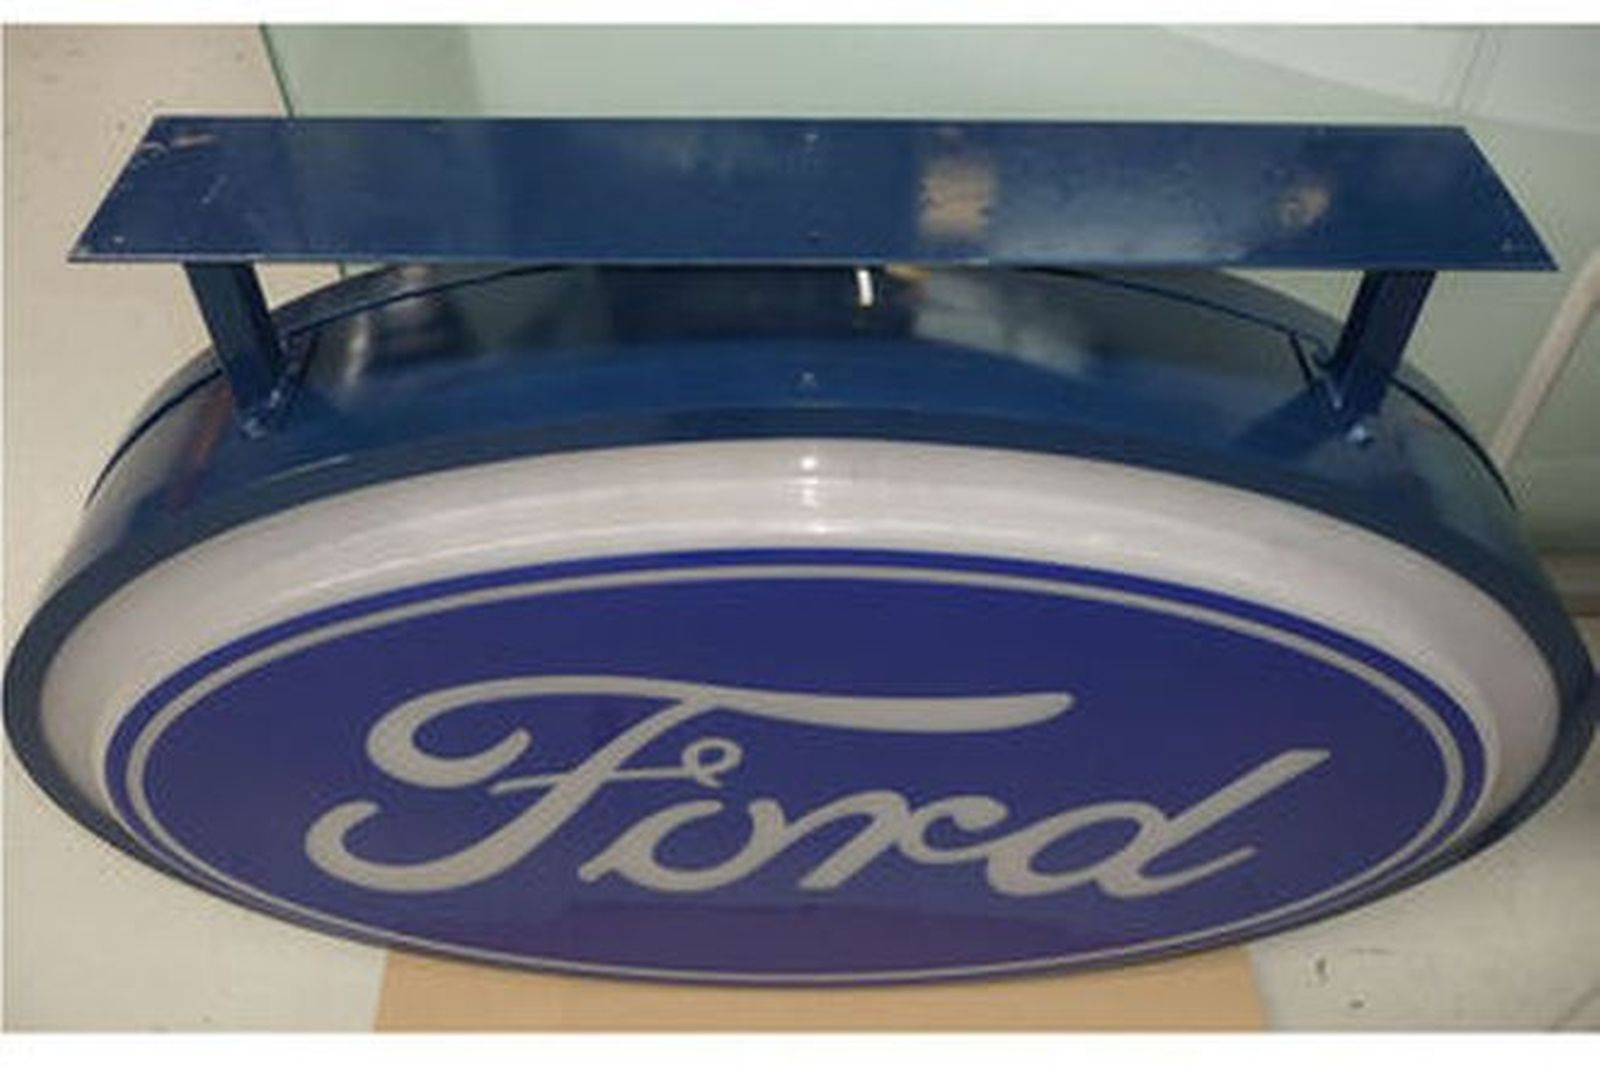 Ford Dealership Light Box - Reproduction (120cm x 85cm)